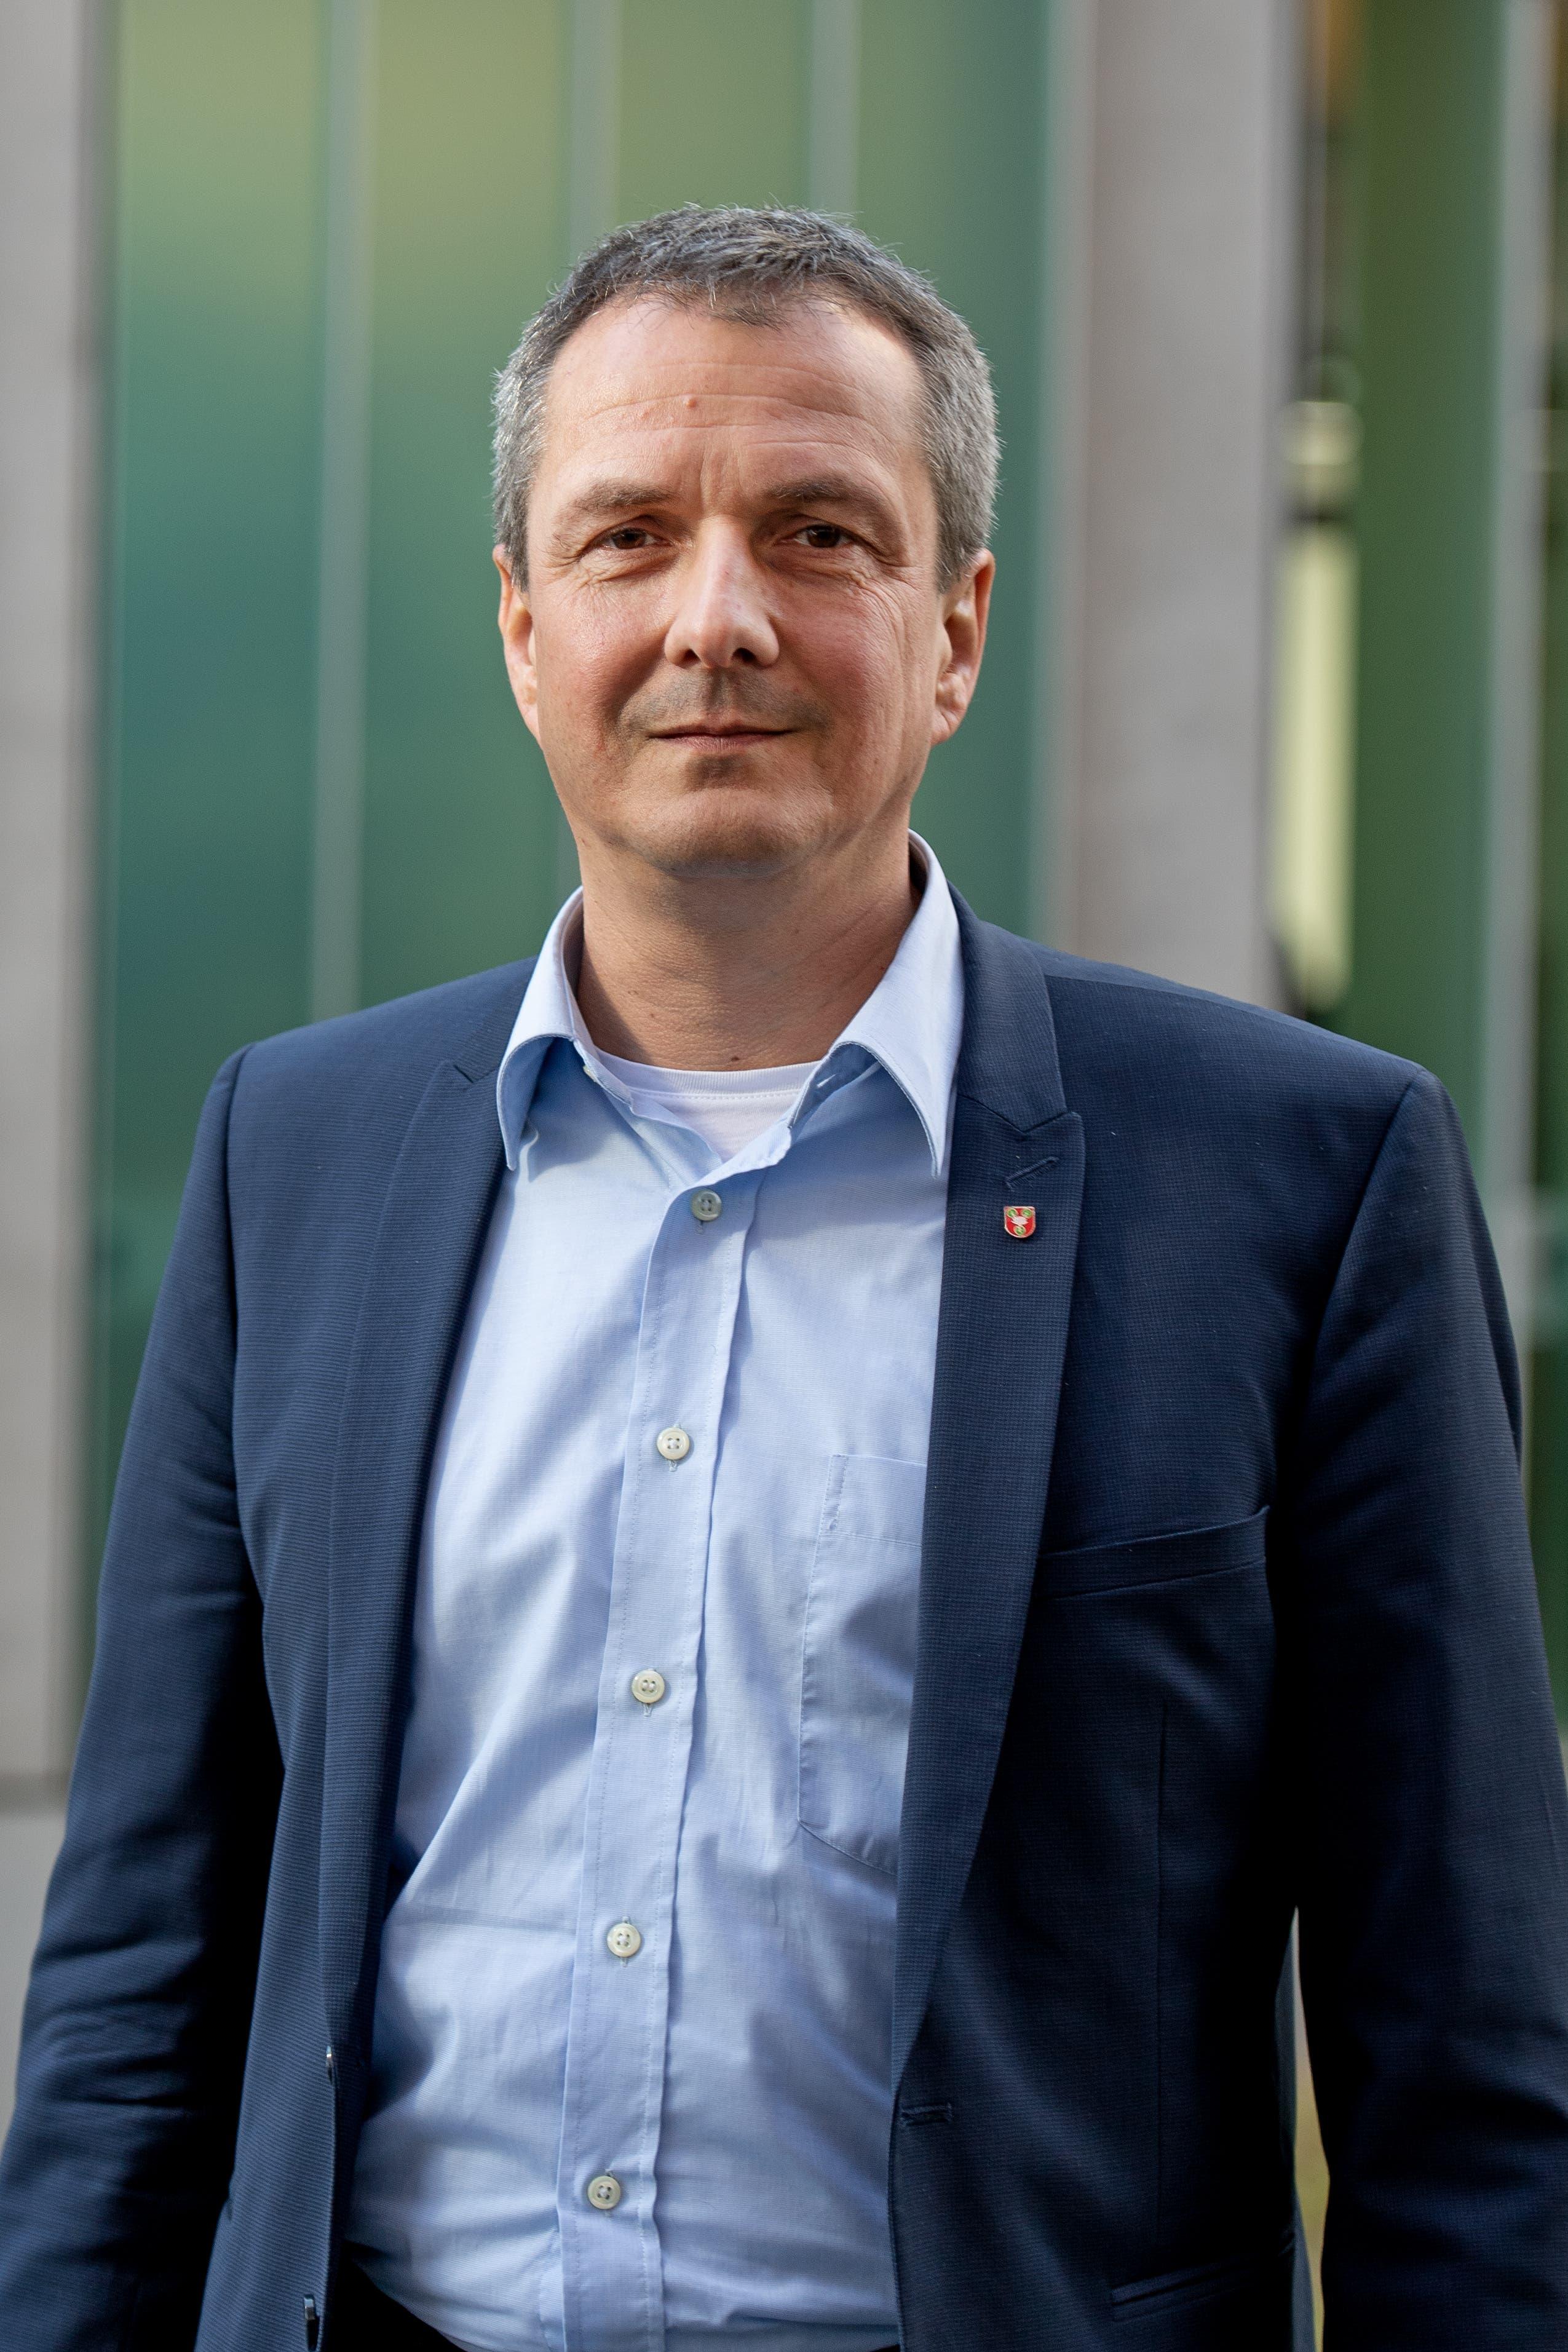 Gewählt: Daniel Gasser, CVP (bisher)